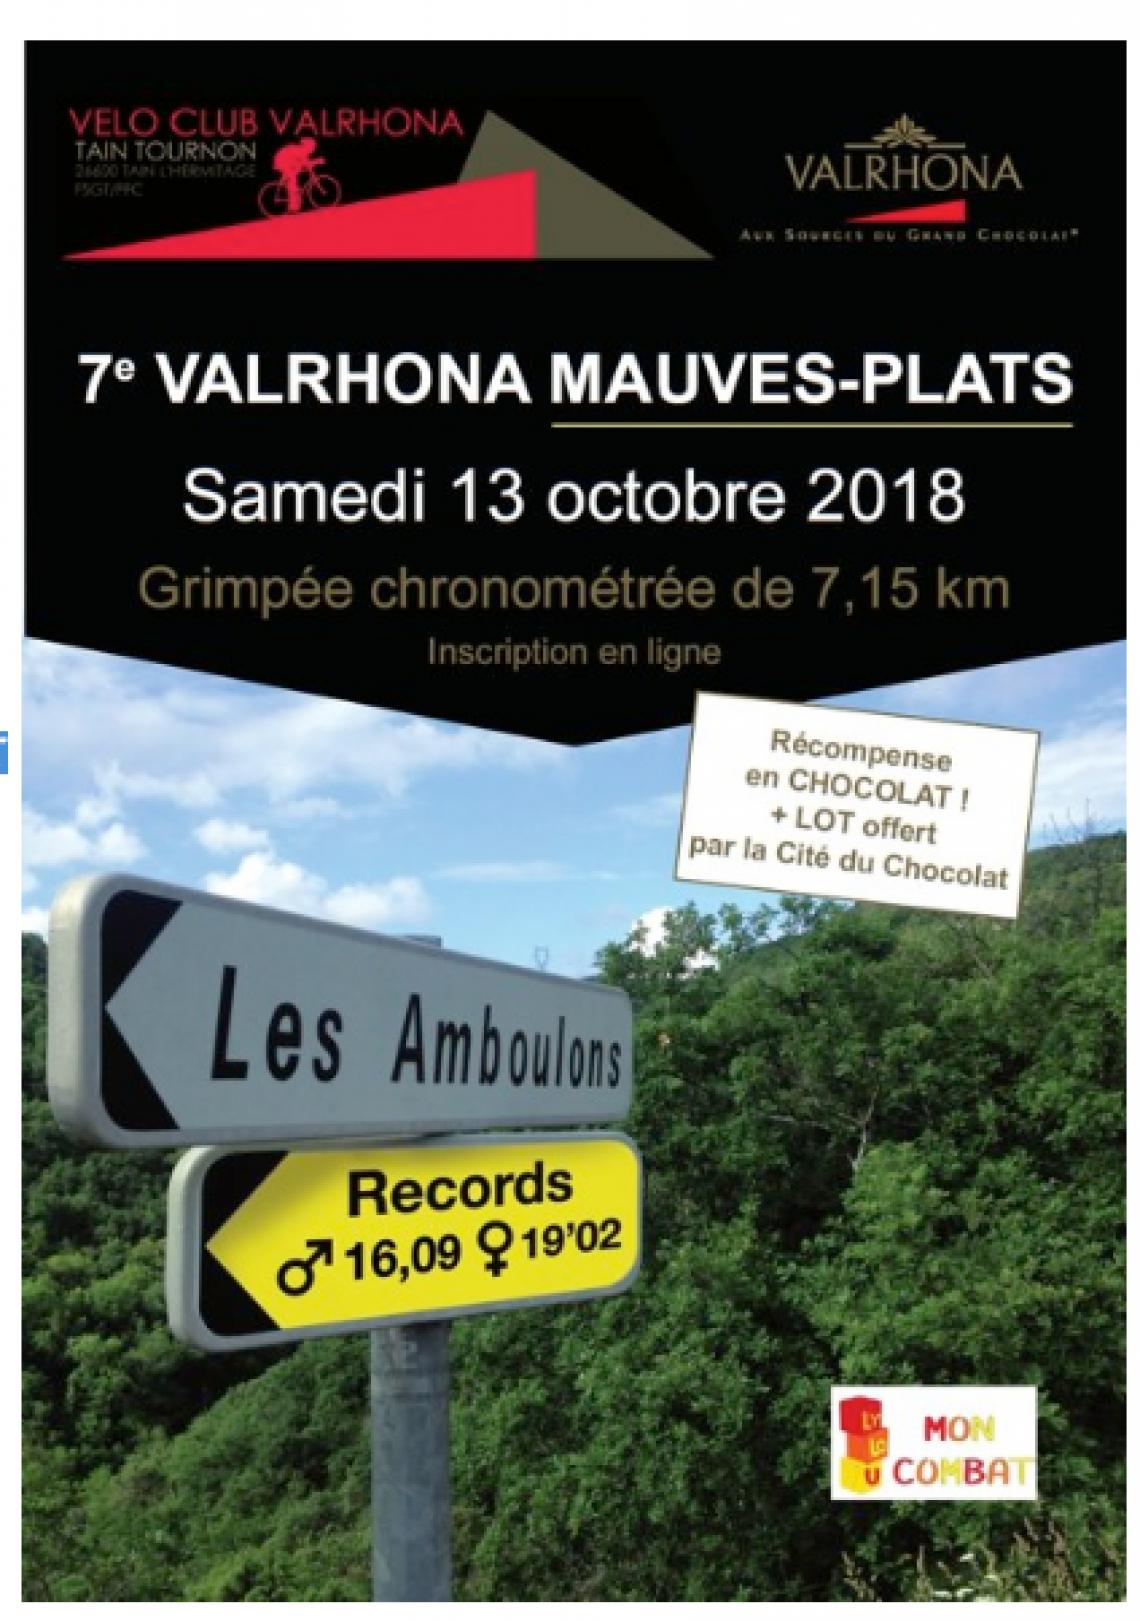 7eme Valrhona MAUVES-PLATS